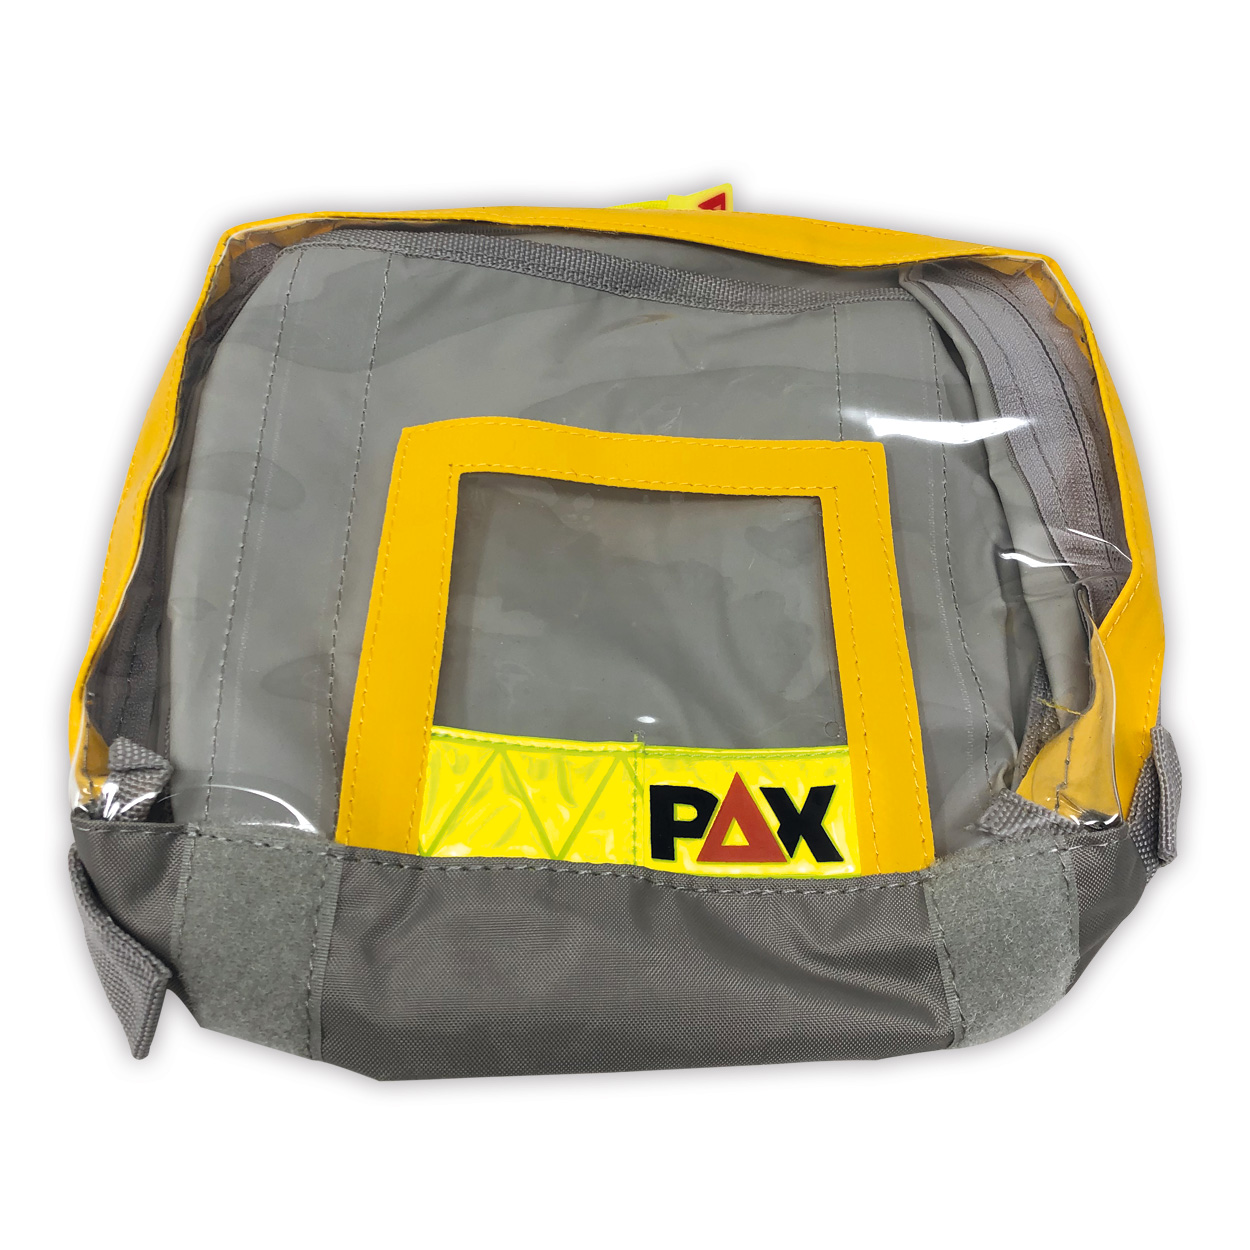 Innentasche FT - PAX-Light in gelb, genäht